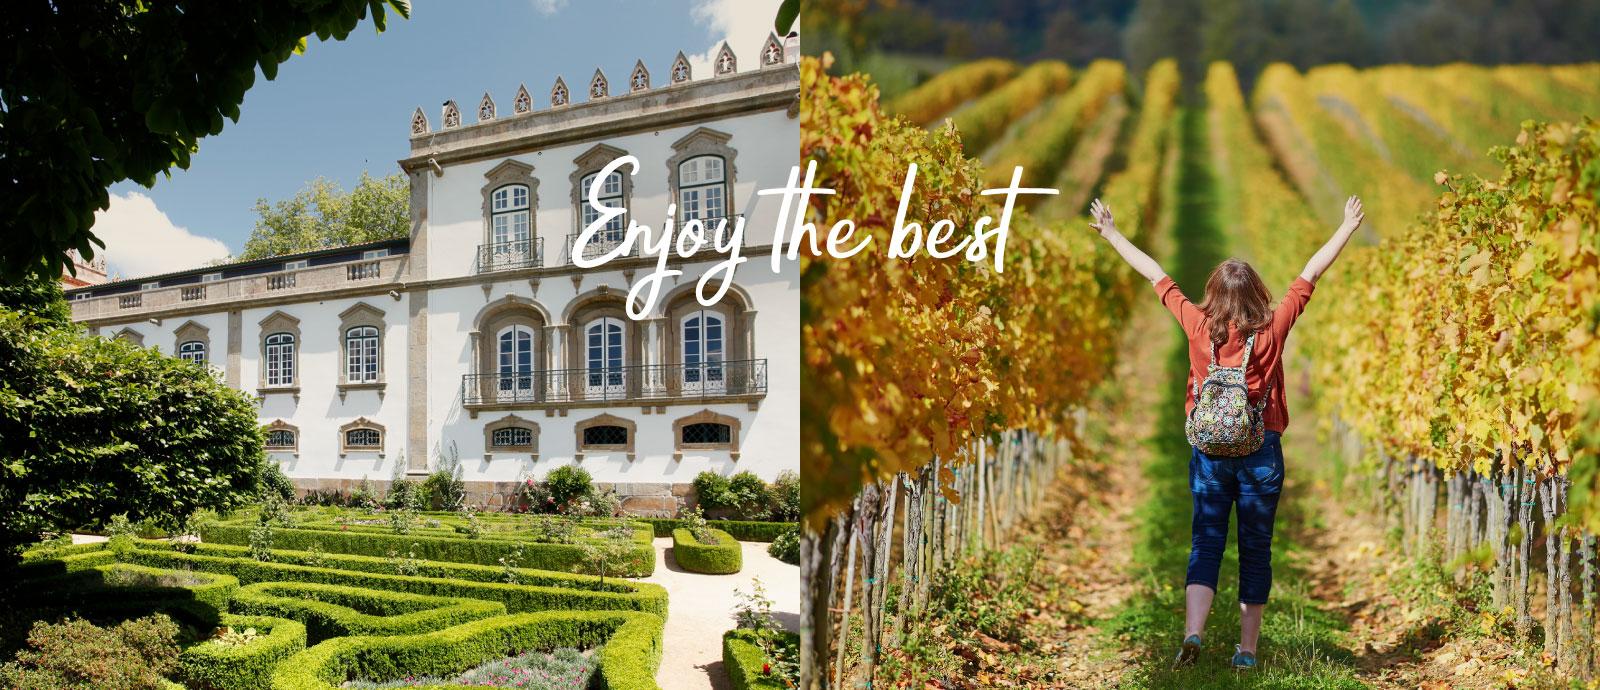 Enjoy the best